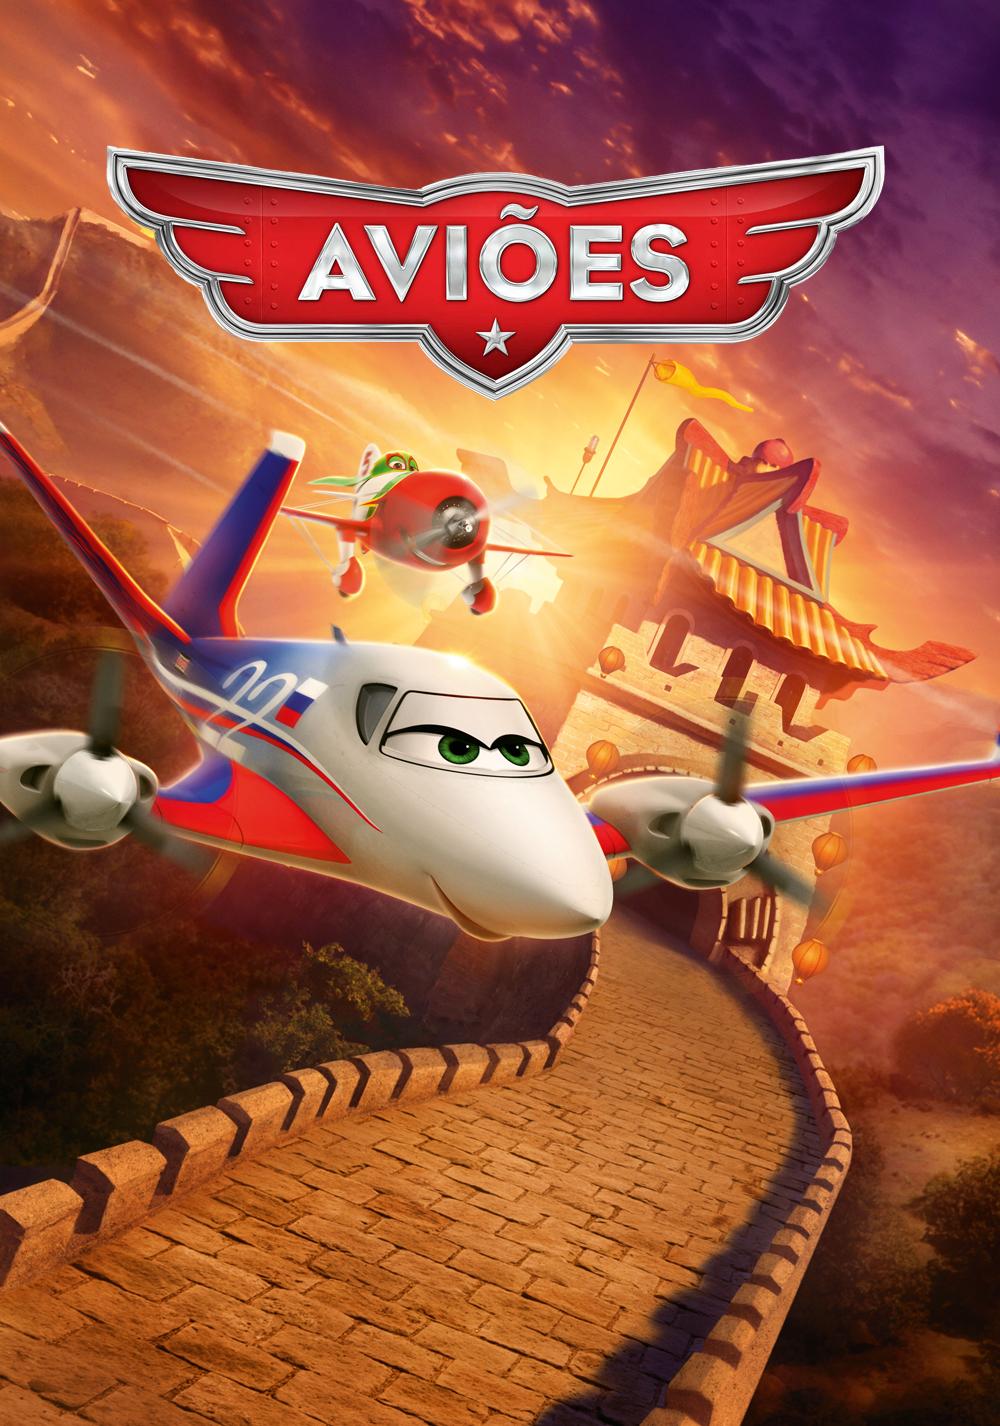 Disney planes movie poster